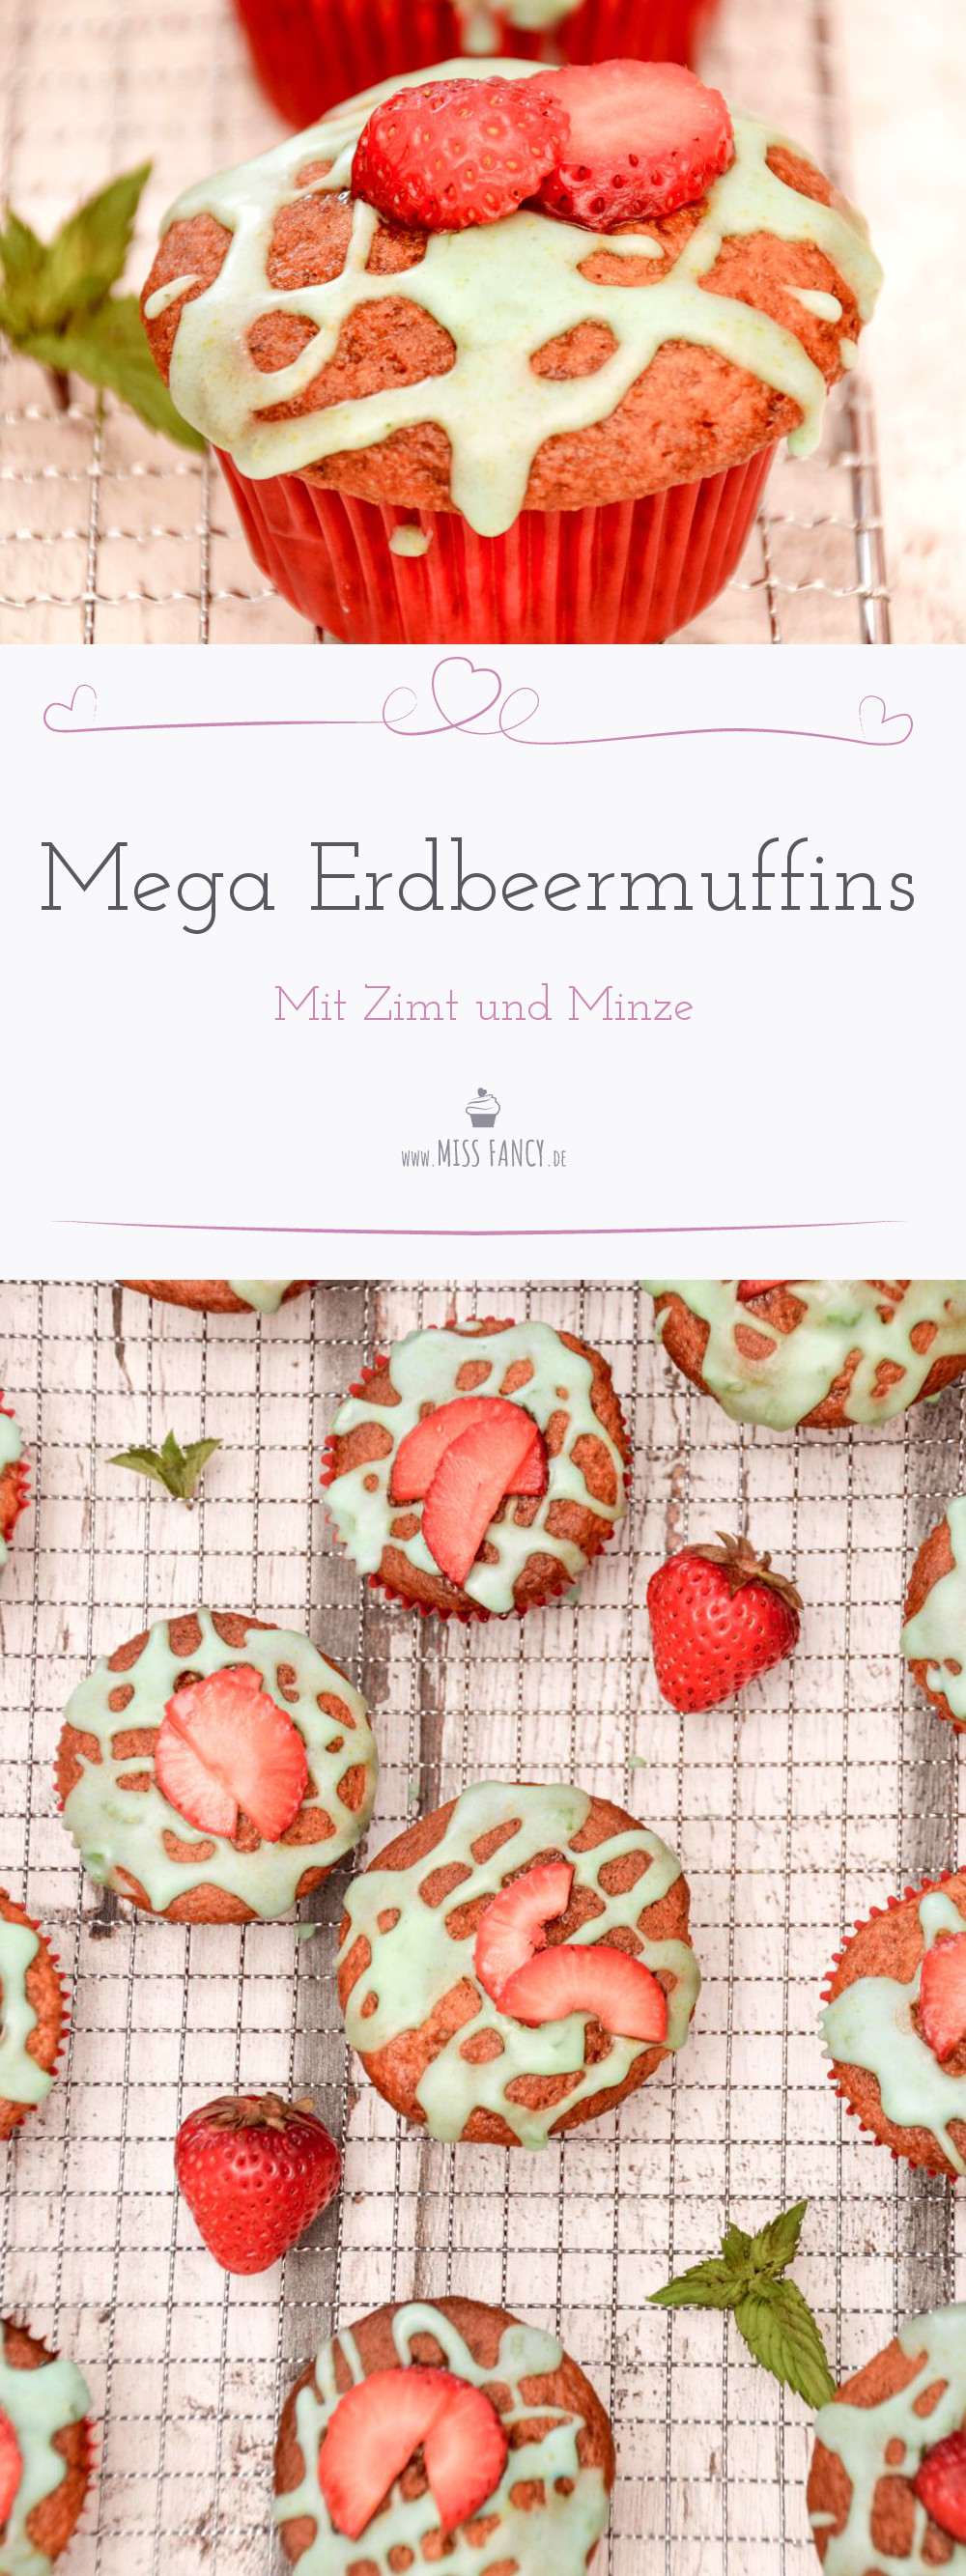 Erdbeer-muffins-missfancy